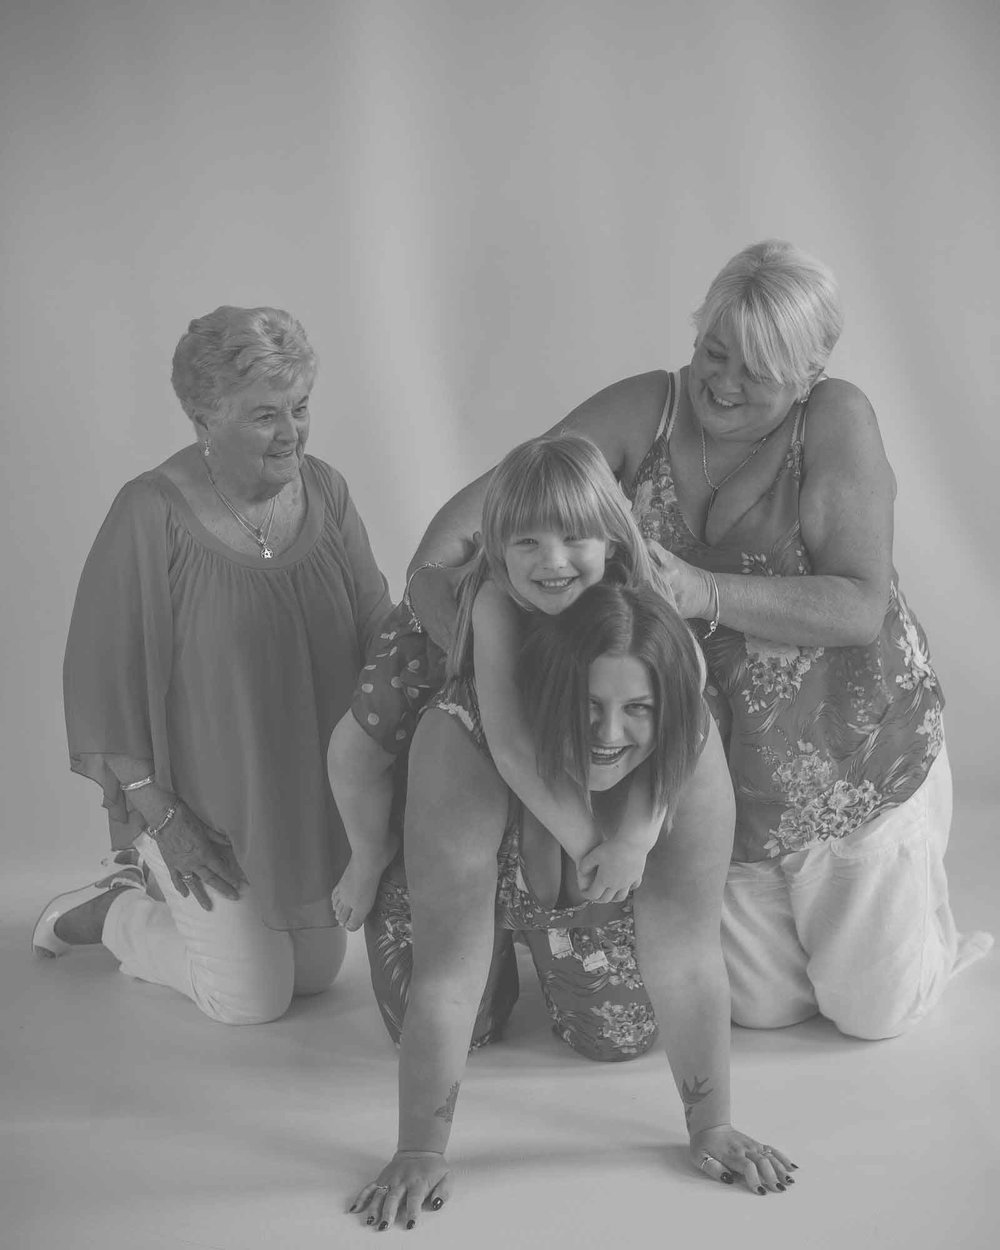 bradford-skipton-keighley-family-photoshoot-chicca-photography-02.jpg